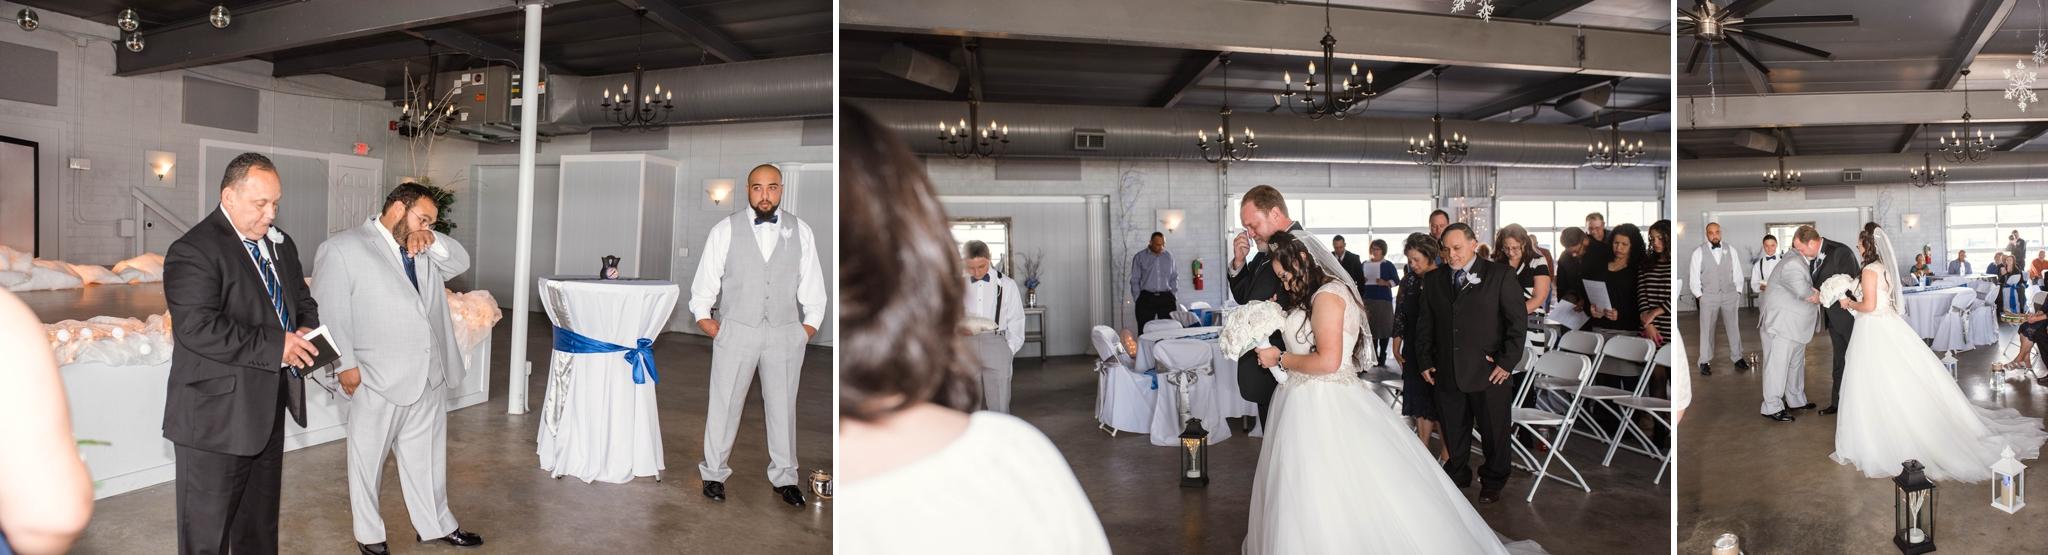 Jacquelin & Dustin - The Venue at Regal Resort in Elizabethtown, North Carolina - Raleigh, NC Wedding Photographer